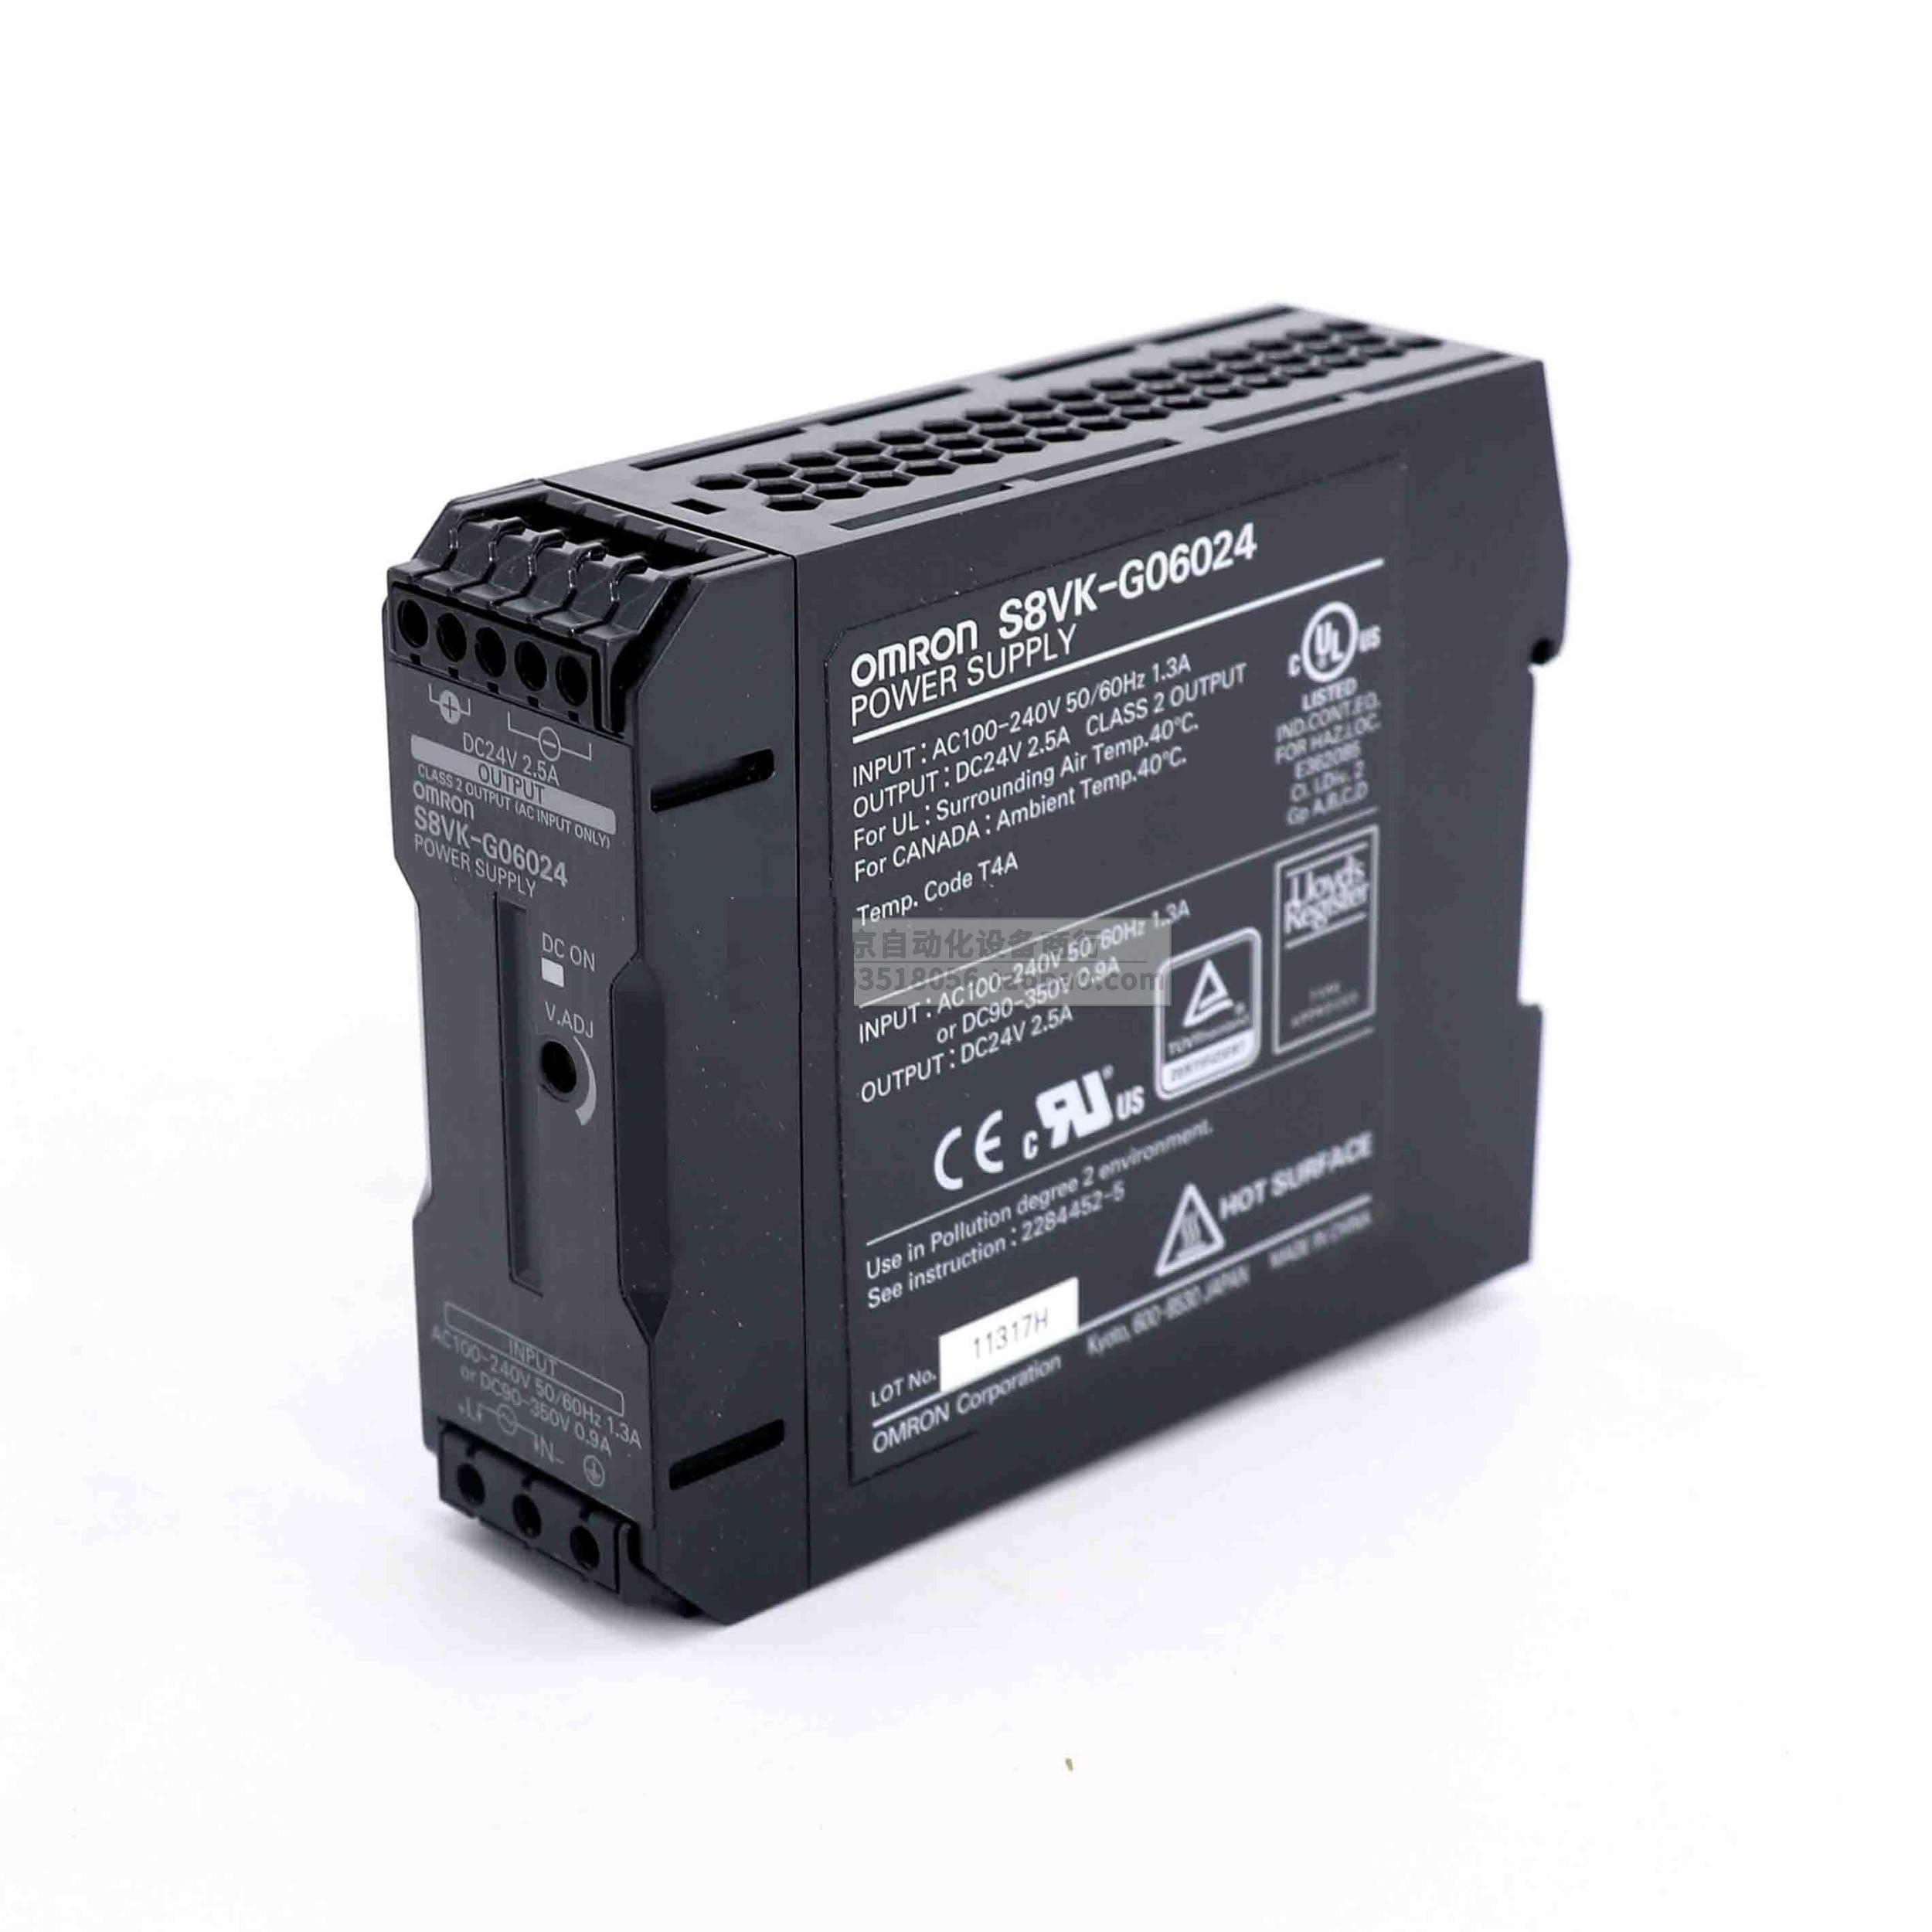 цена на OMRON ( China ) S8VK-G12024 Switching Power Supply DRIVER G06024 G24024 G48024 480W 240W 60W 120W DC24V